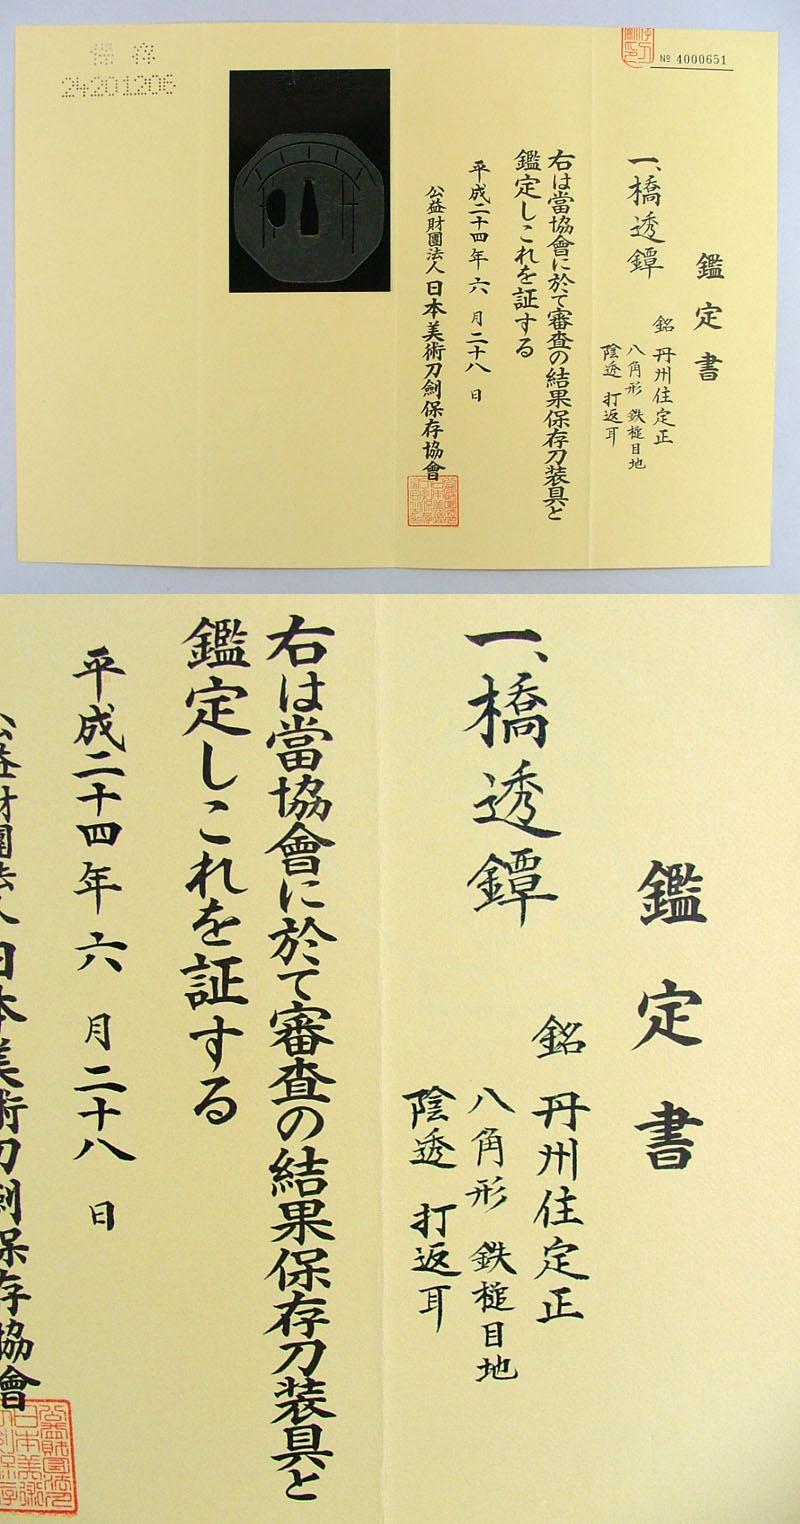 橋透鍔 丹州住定正 Picture of Certificate